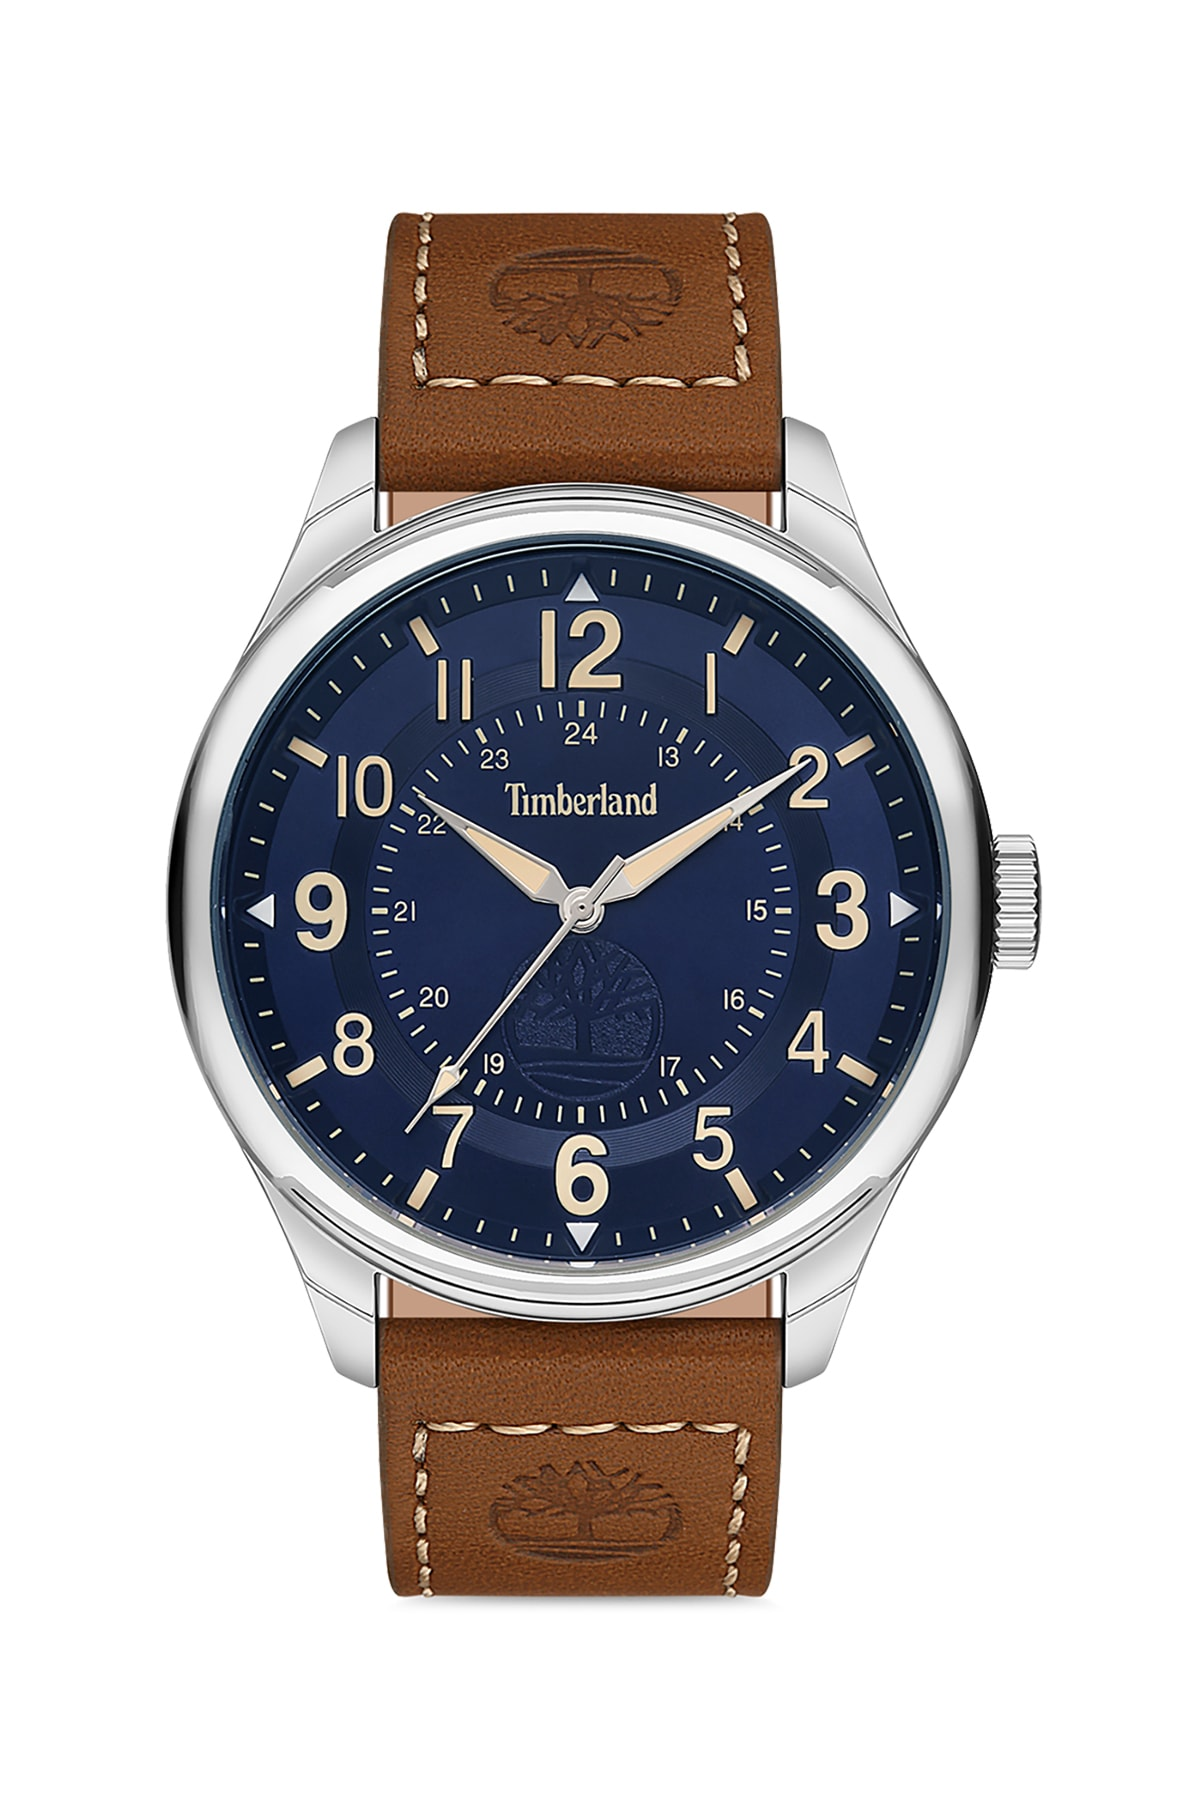 TIMBERLAND Fashion Business Men Watch Luxury Brand  Wrist Watch  Quartz Watches Relogio Masculino  TBL.15075JYS-03